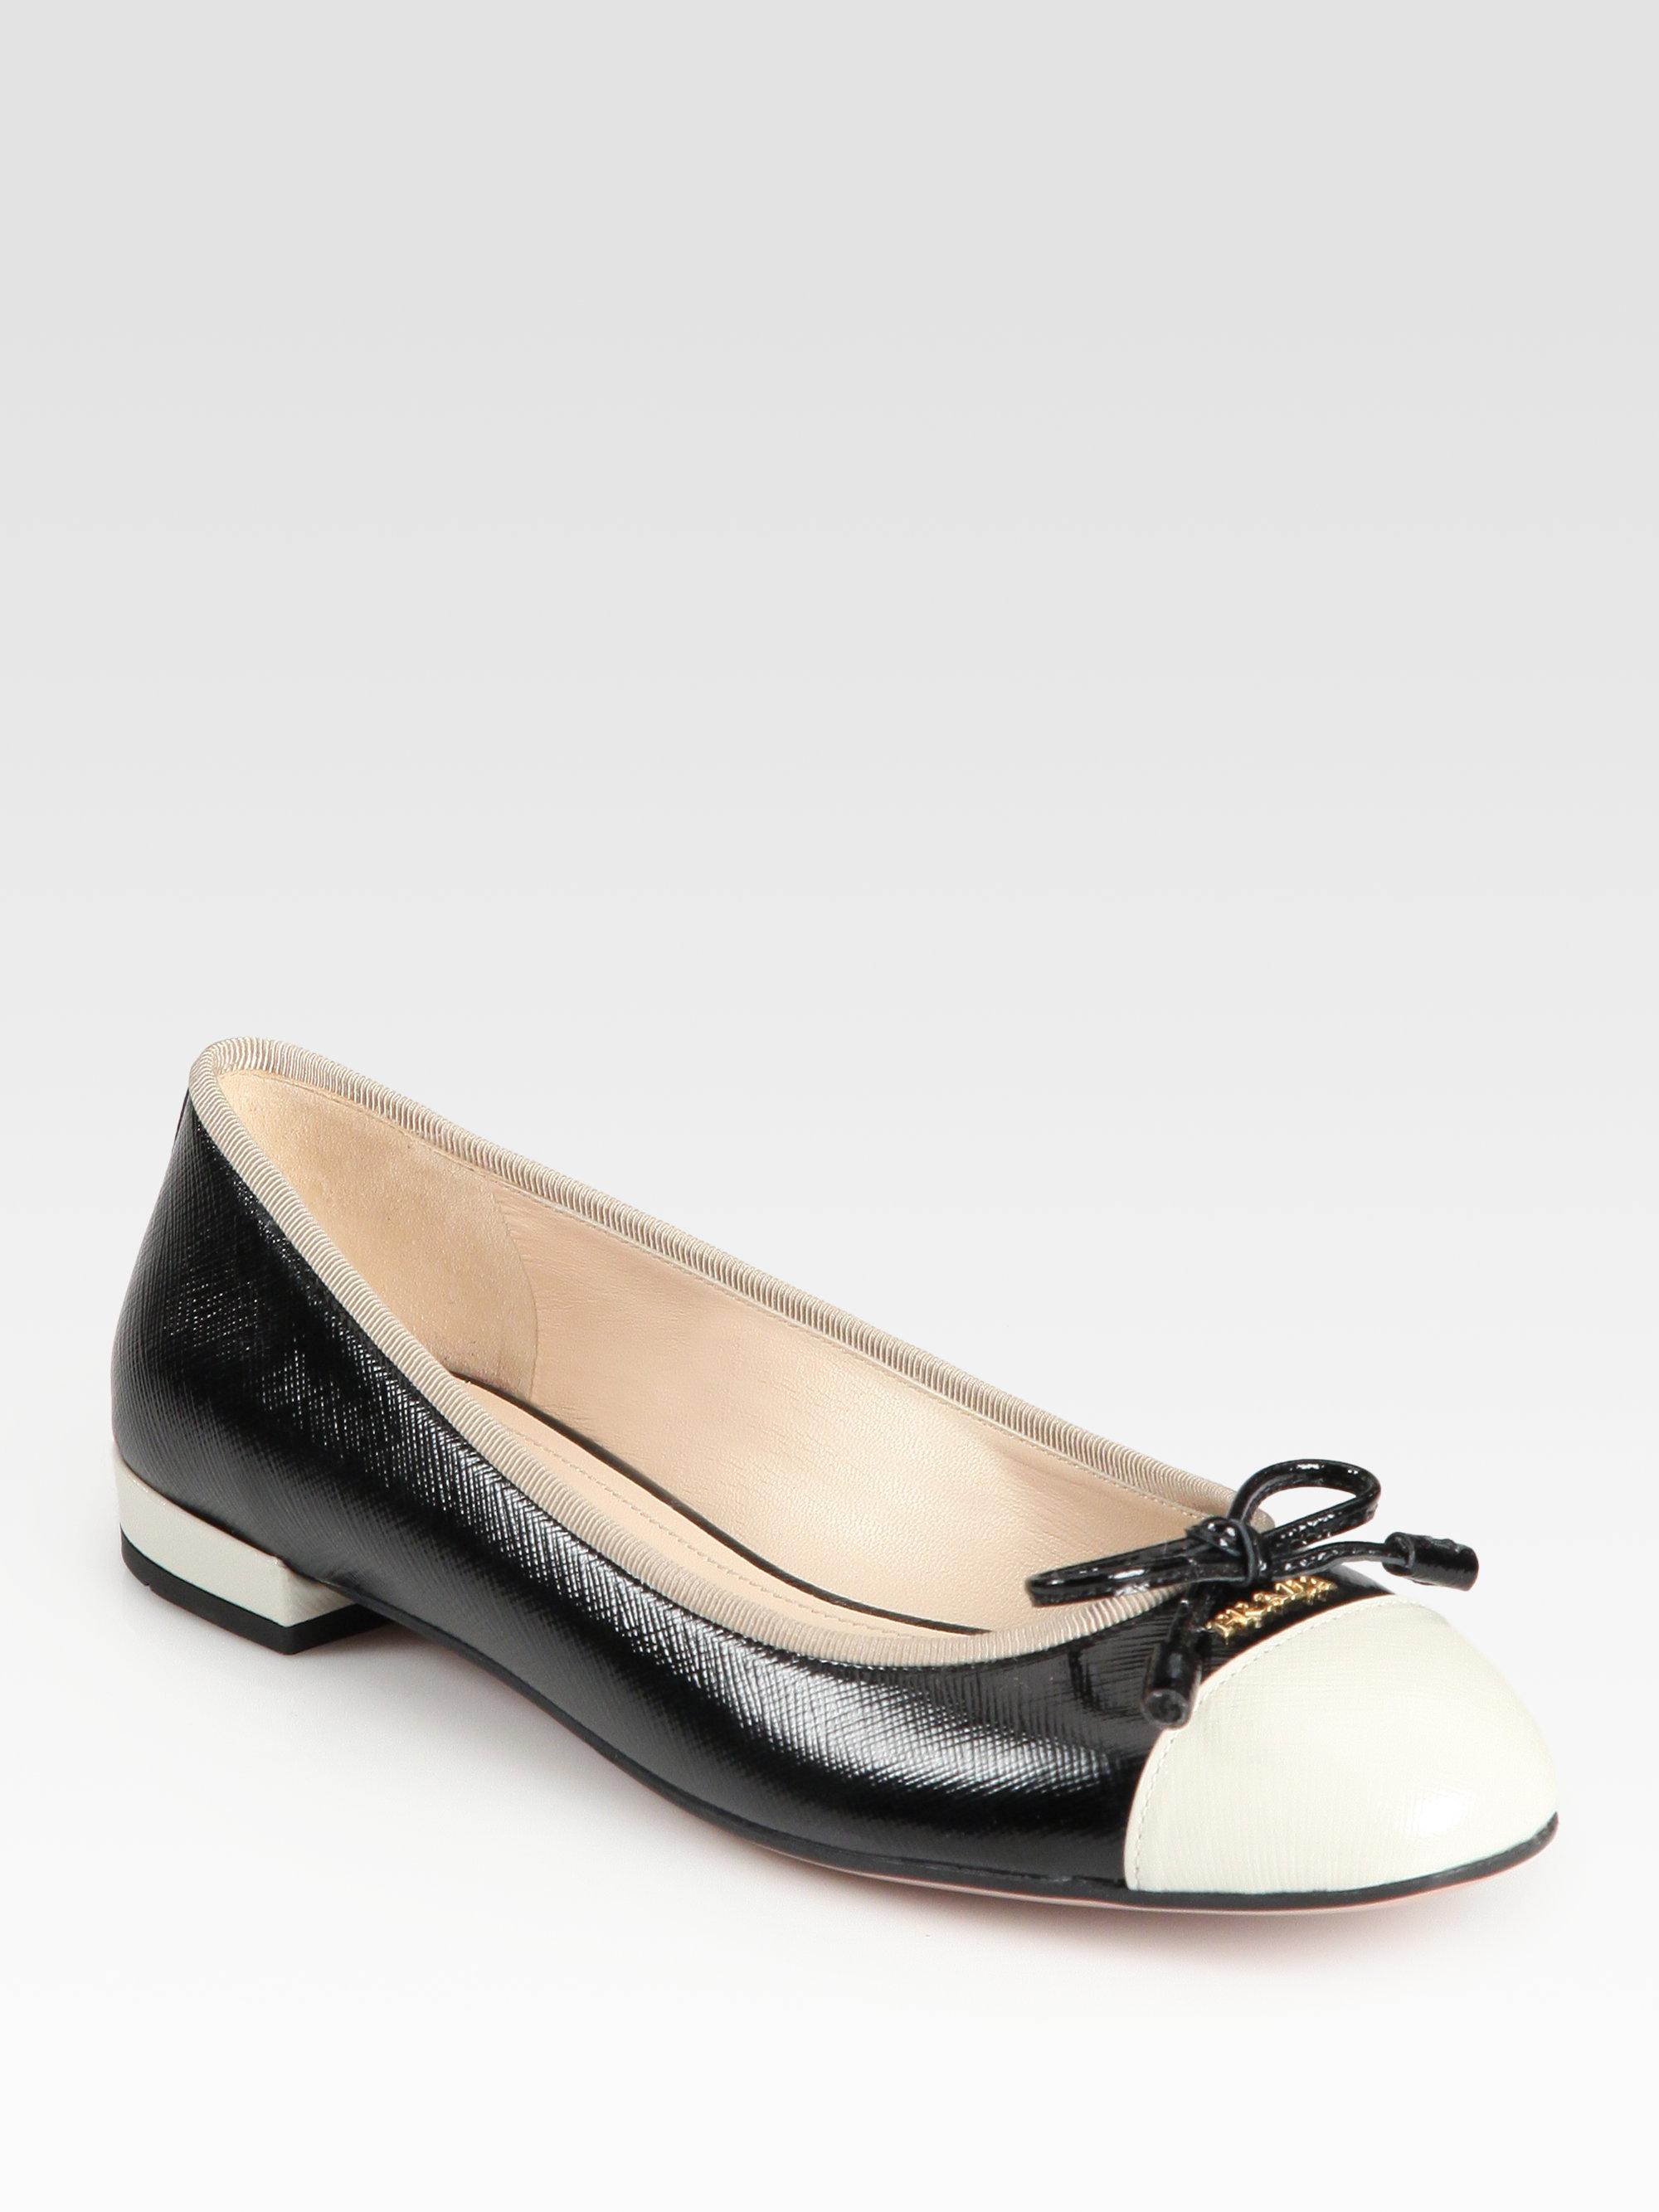 Prada Grey Leather Ballet Flats